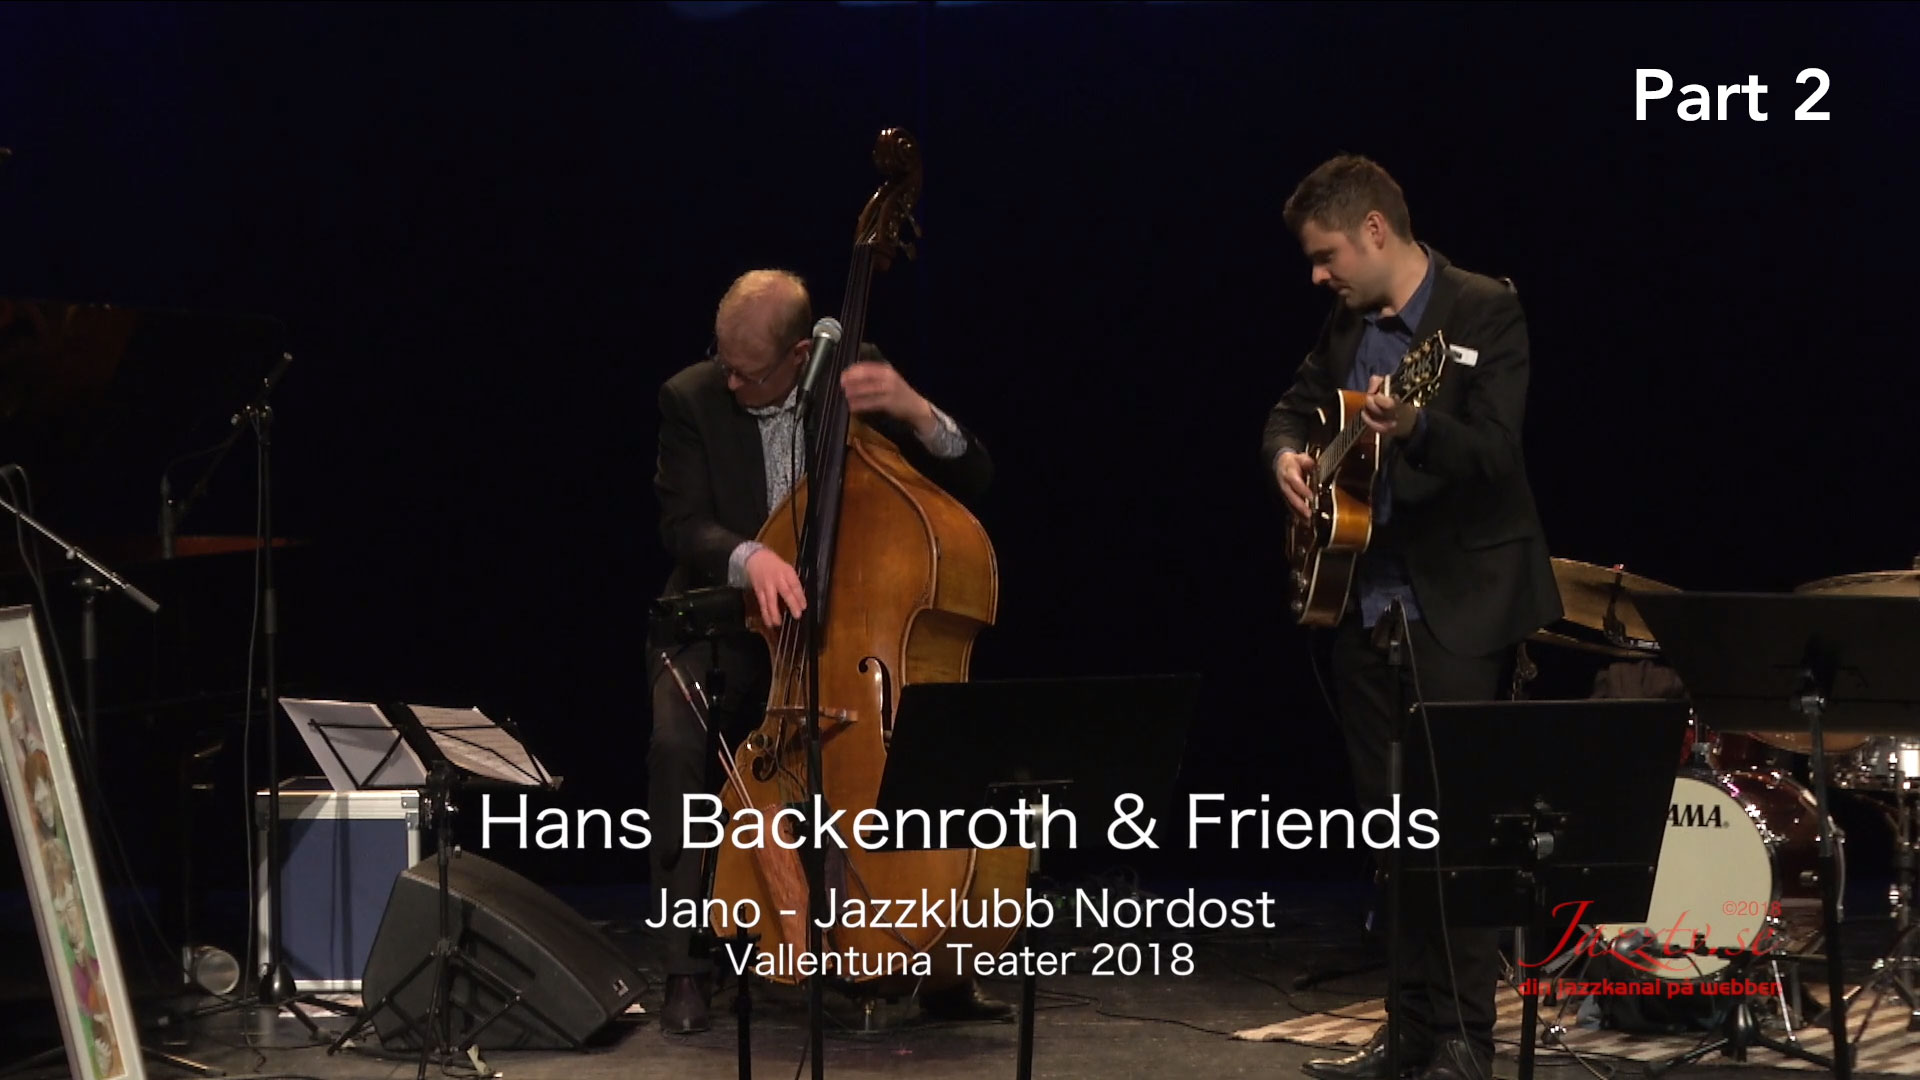 Hans Backenroth & Friends